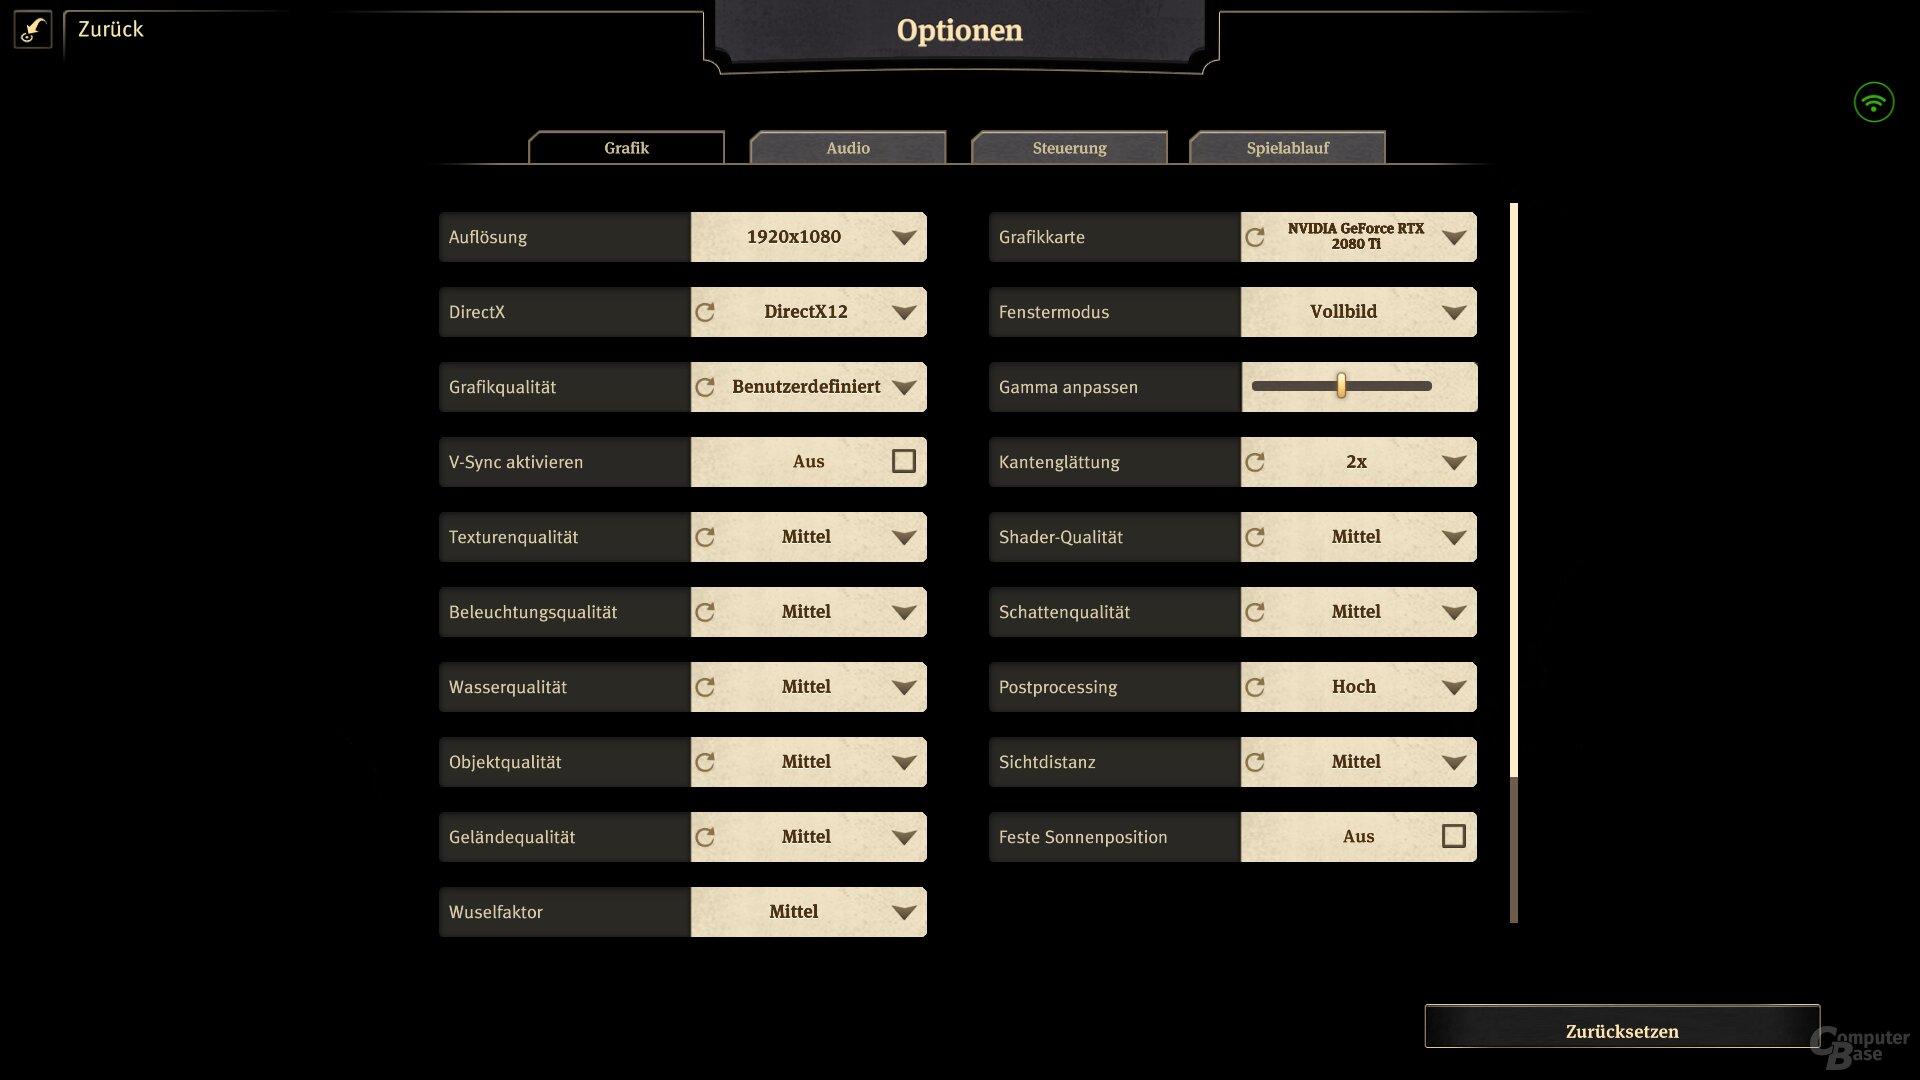 Reduzierte Settings in Full HD